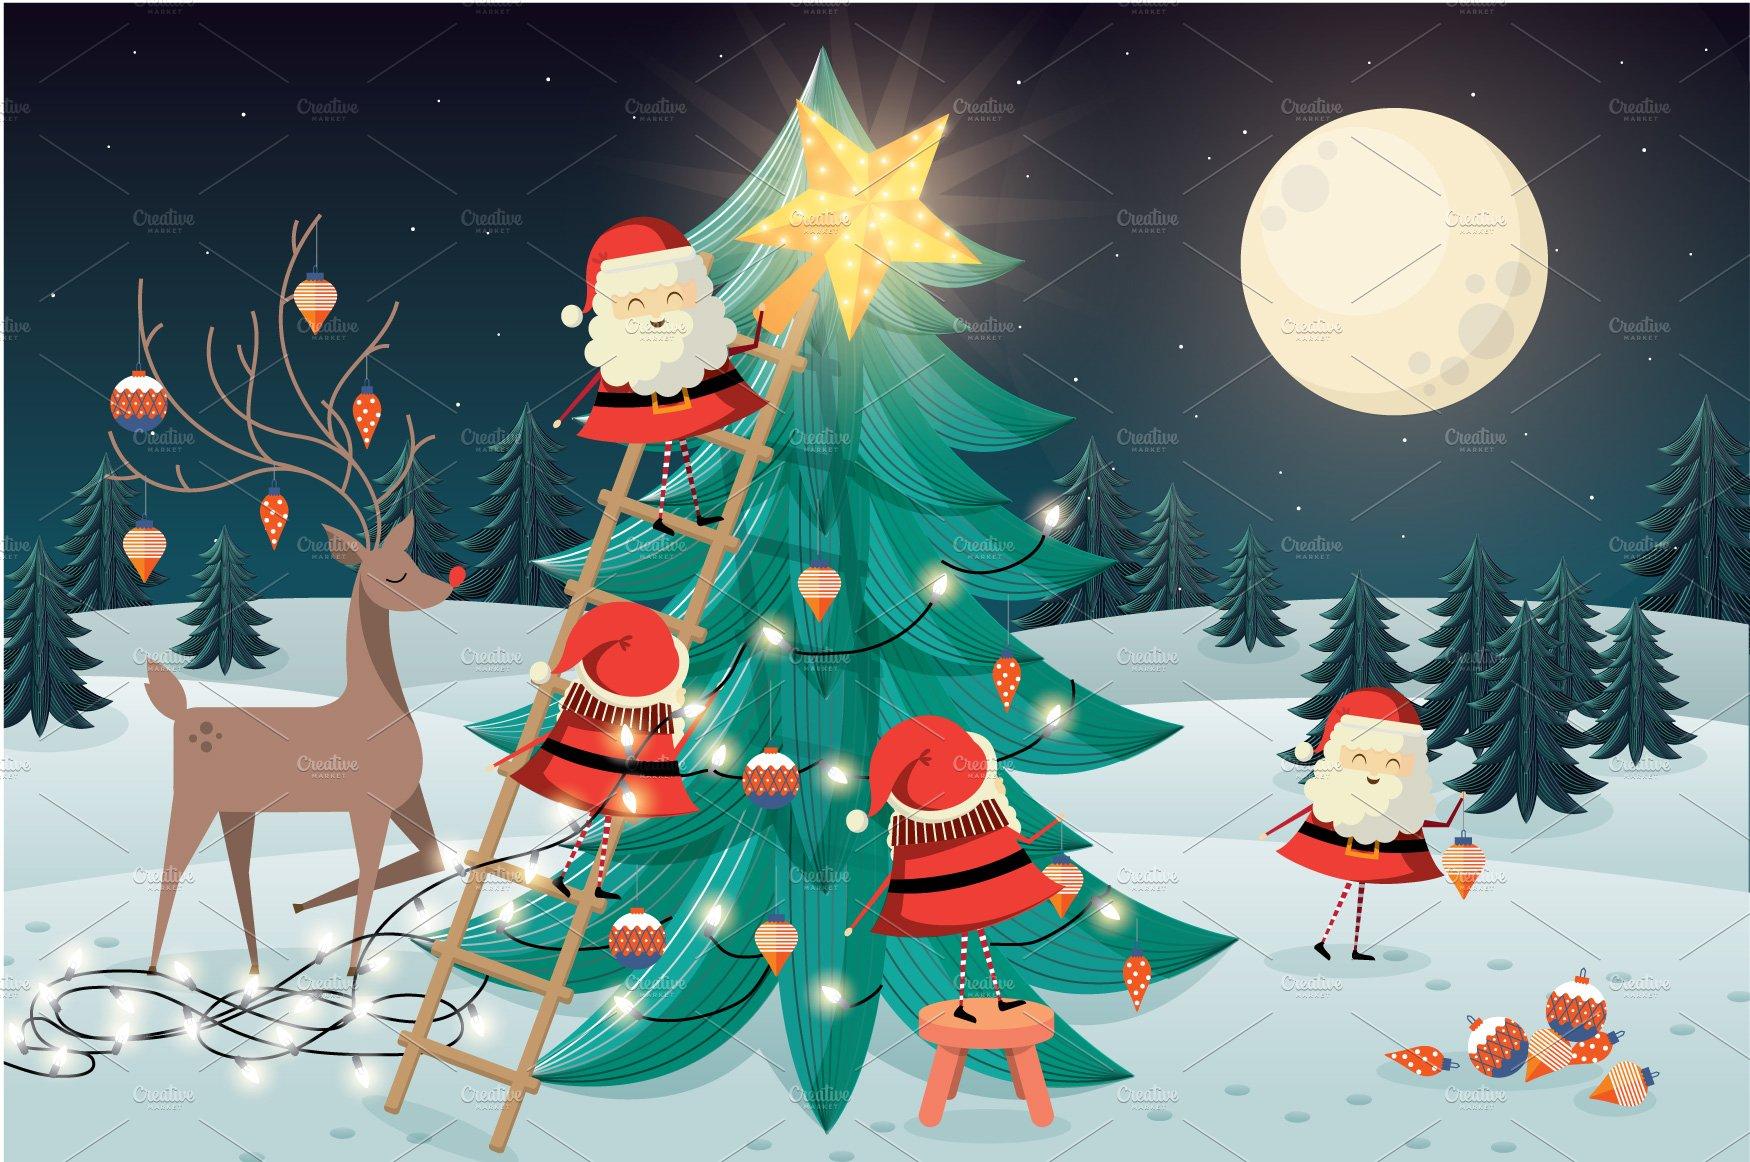 santas putting up christmas tree ~ Illustrations ...